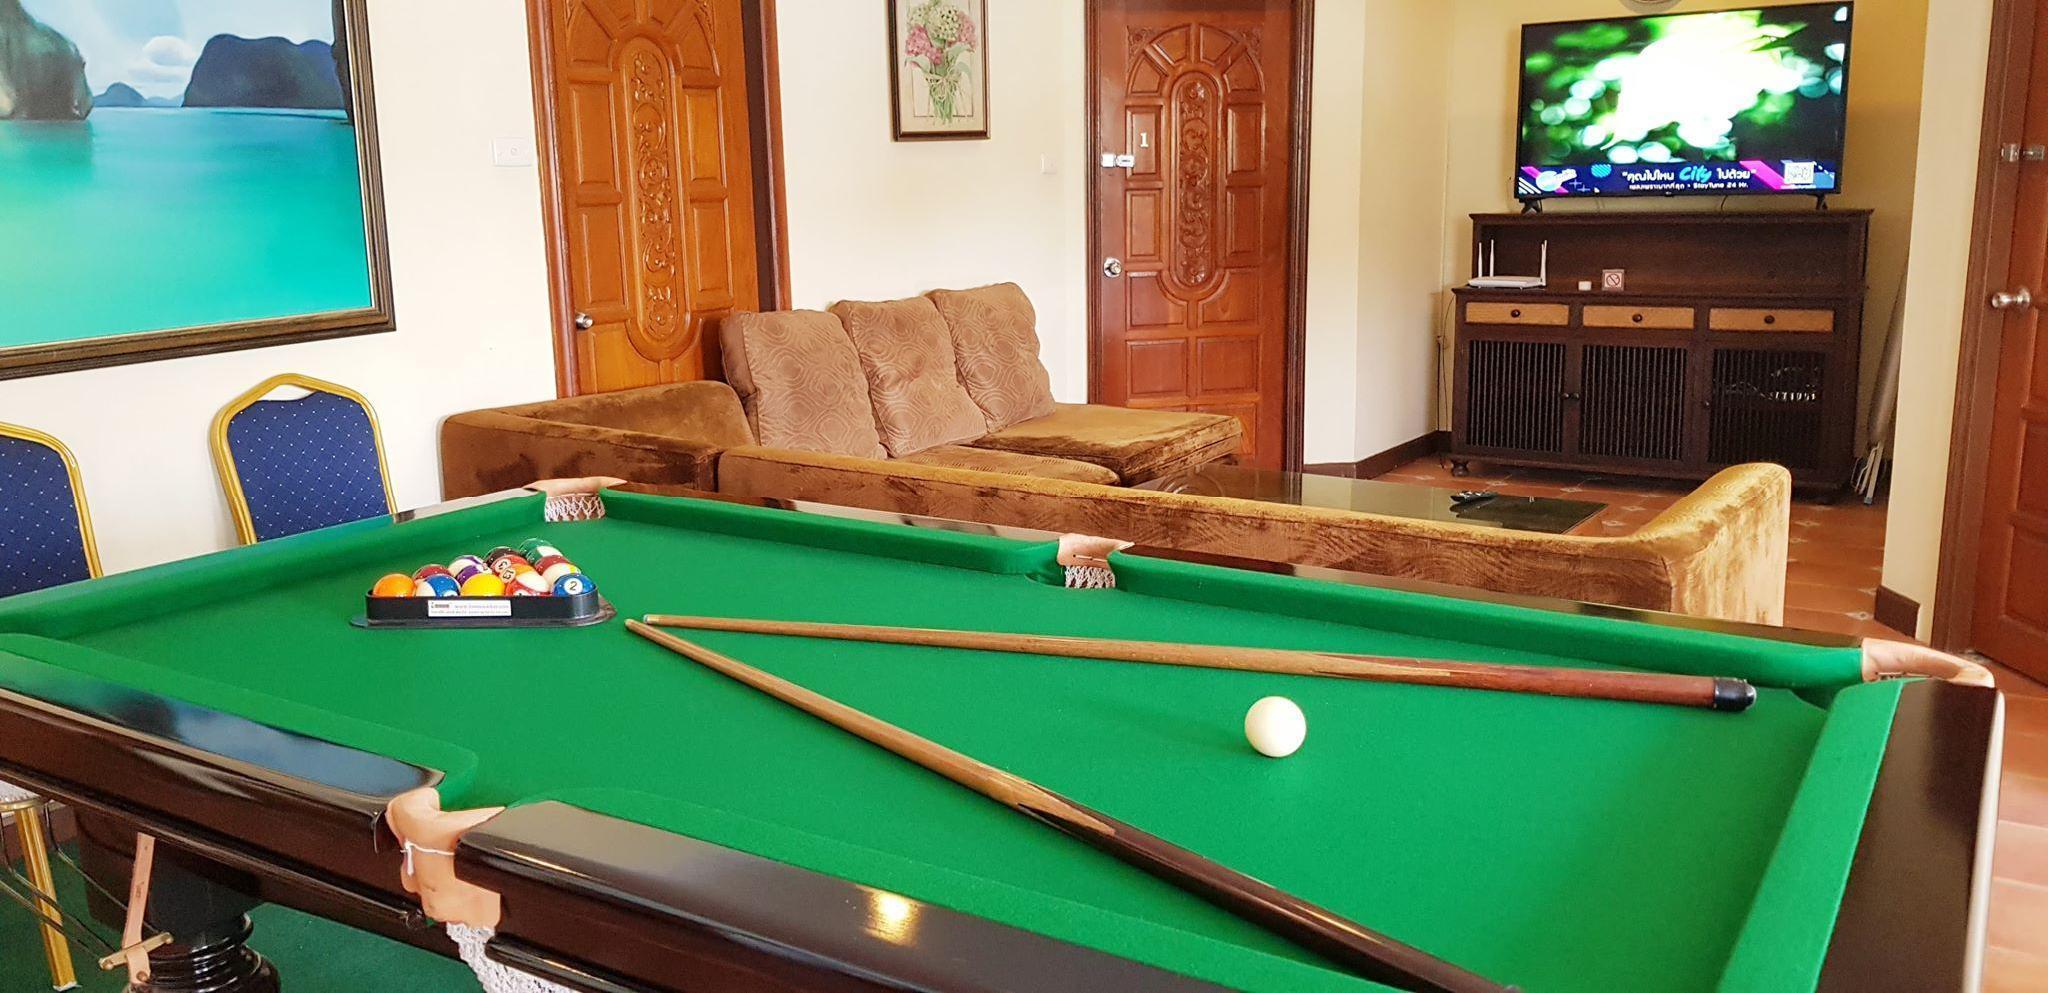 Pool villa 4 bedrooms Viewbor 5 min Walking Street วิลลา 4 ห้องนอน 4 ห้องน้ำส่วนตัว ขนาด 200 ตร.ม. – พัทยาใต้